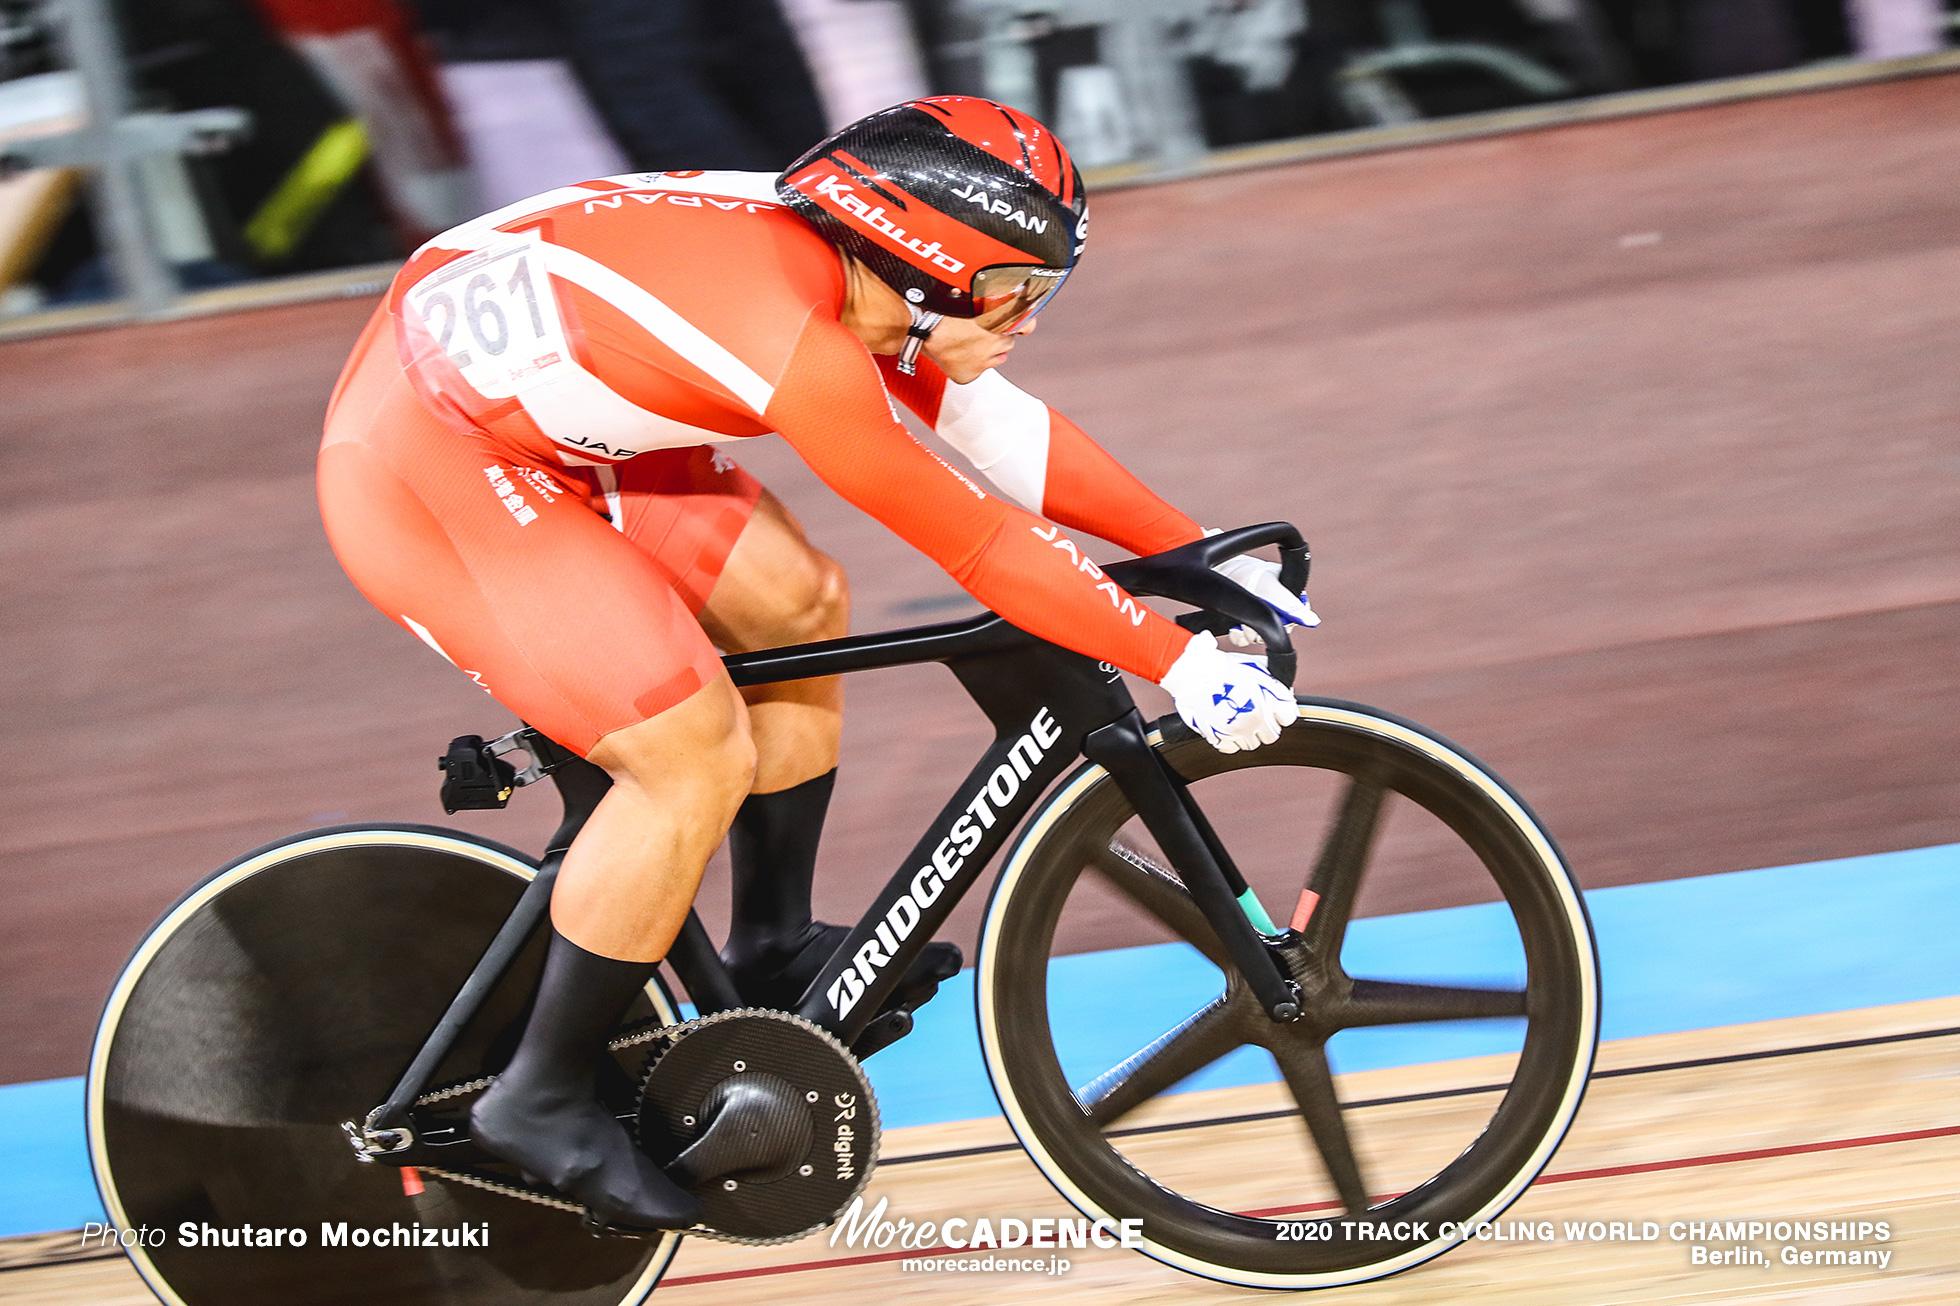 1/4 Finals / Men's Sprint / 2020 Track Cycling World Championships, Nitta Yudai 新田祐大